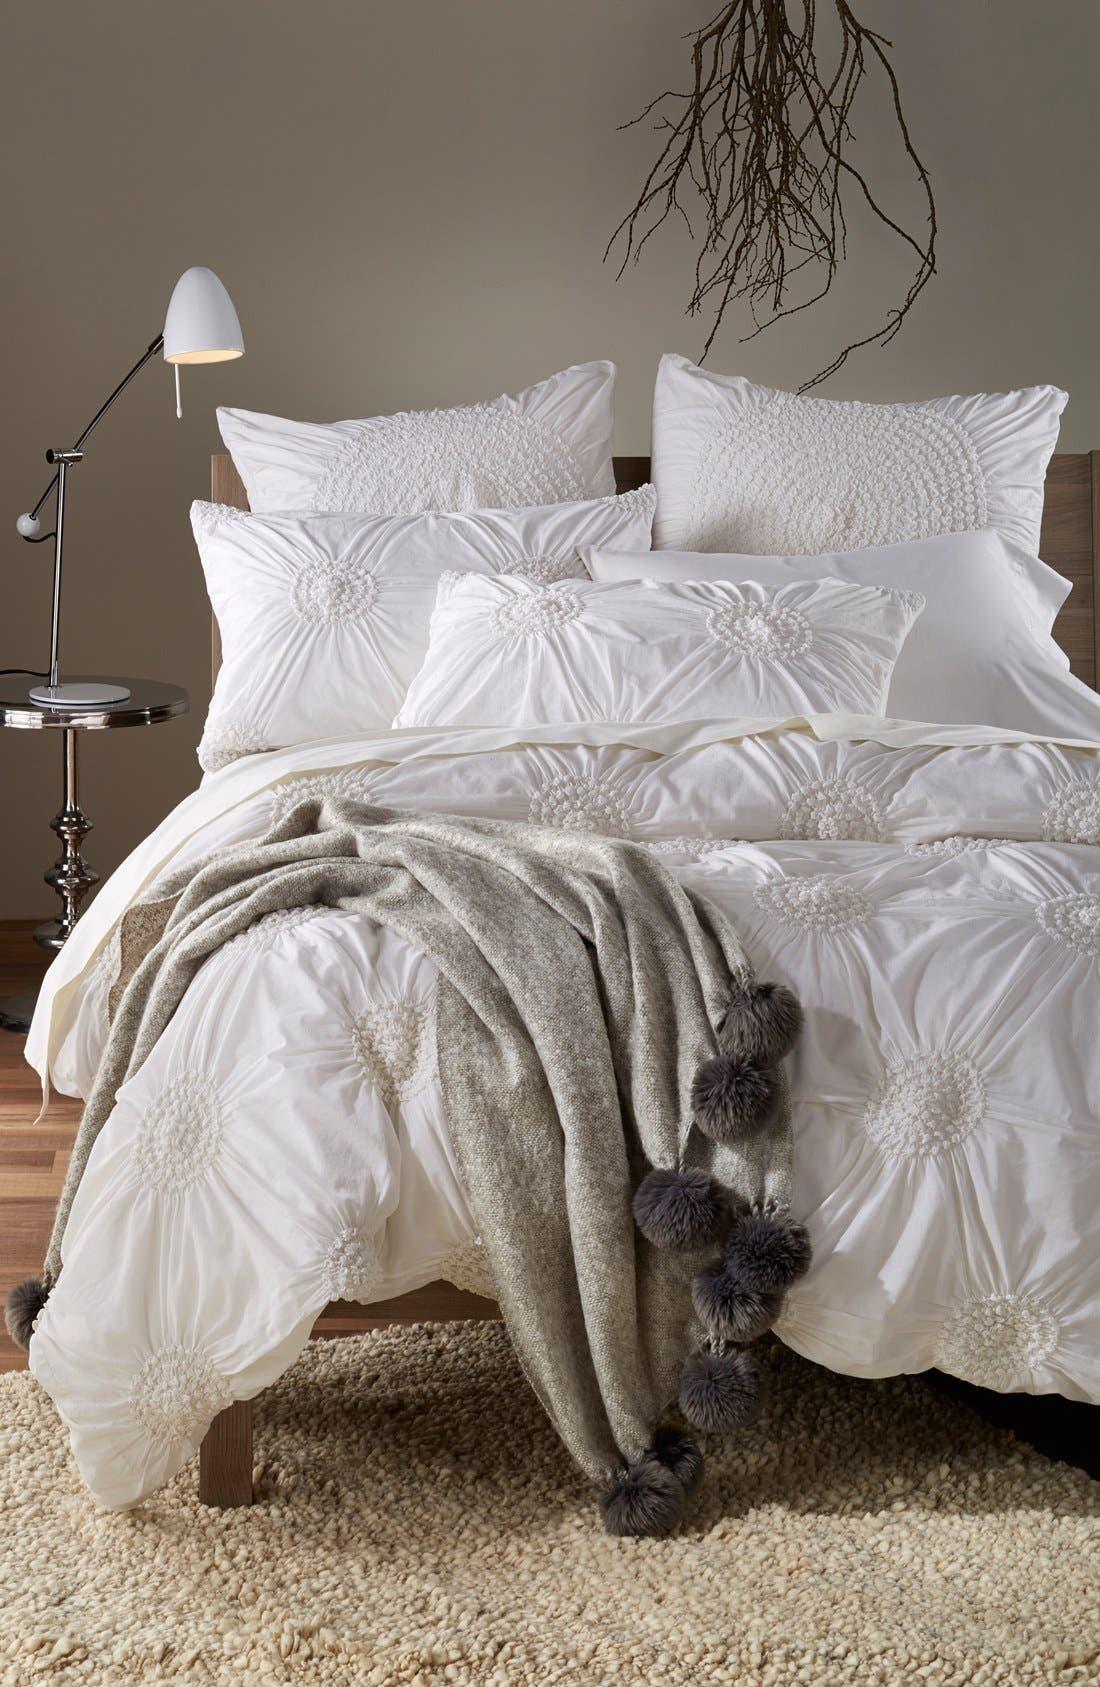 Bedspread designs texture - Bedspread Designs Texture 58